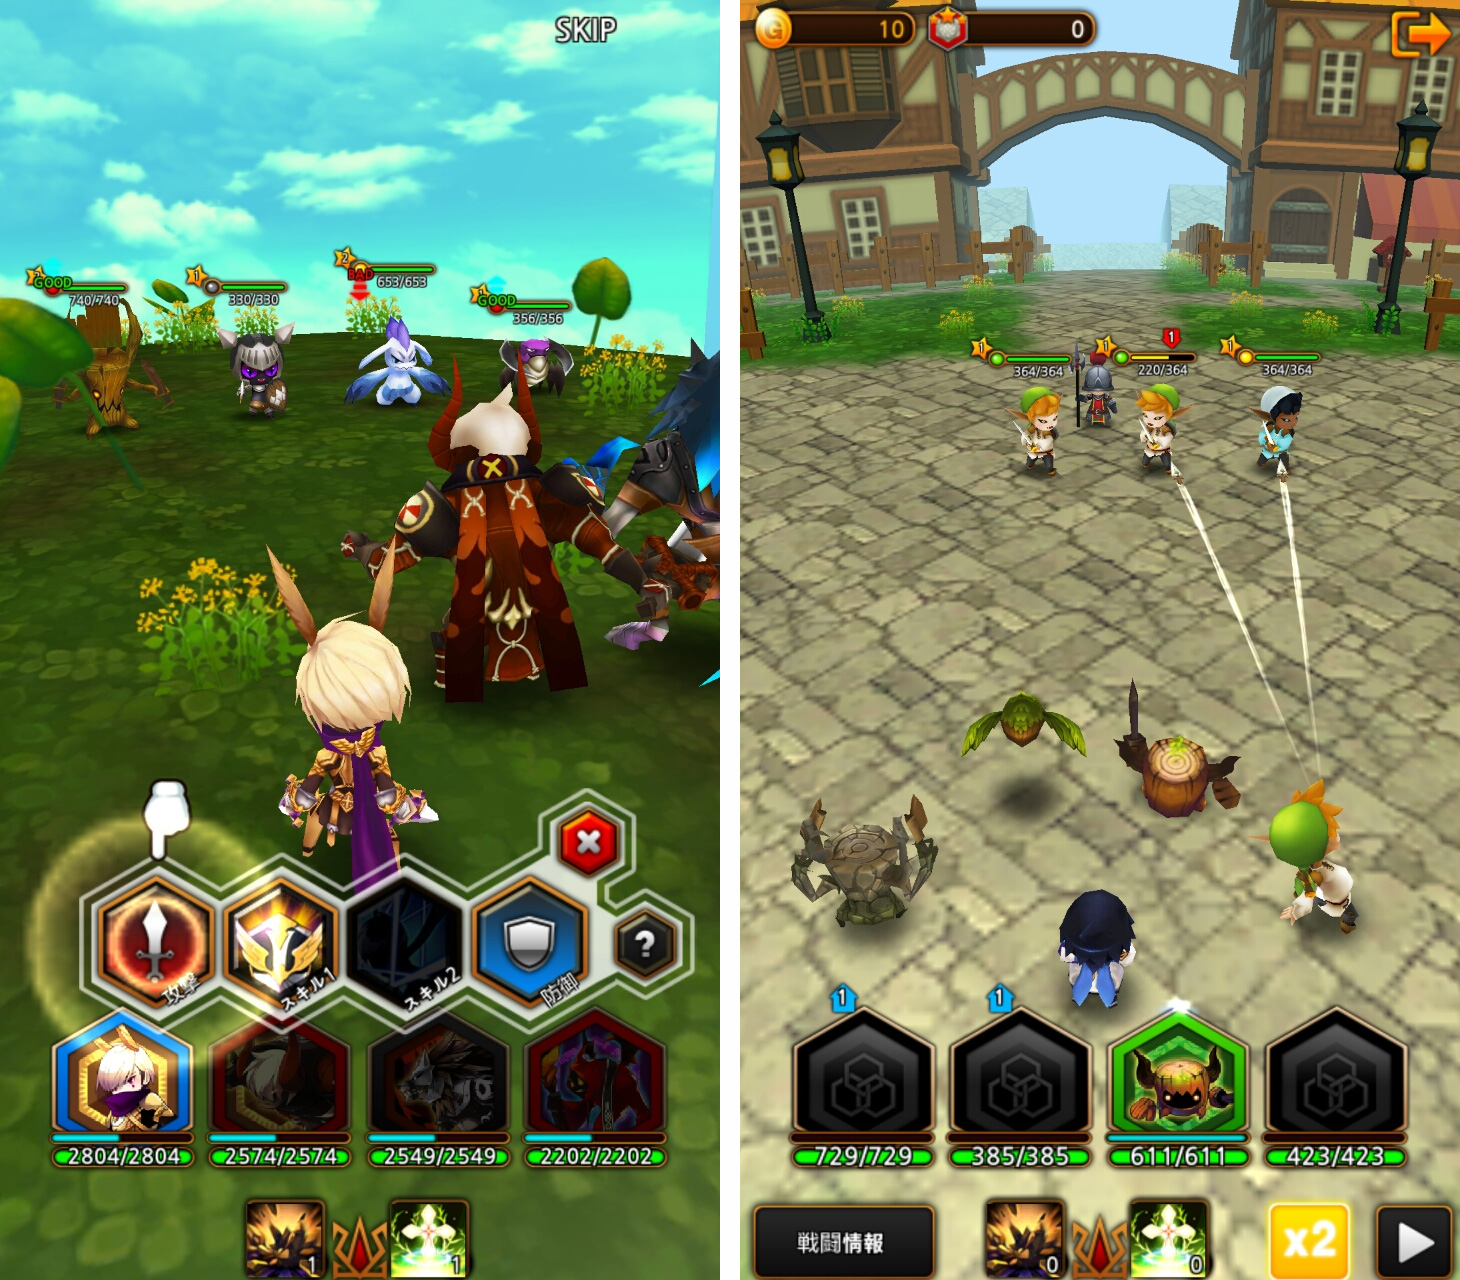 Hexmon戦争(Hexmon War) androidアプリスクリーンショット1